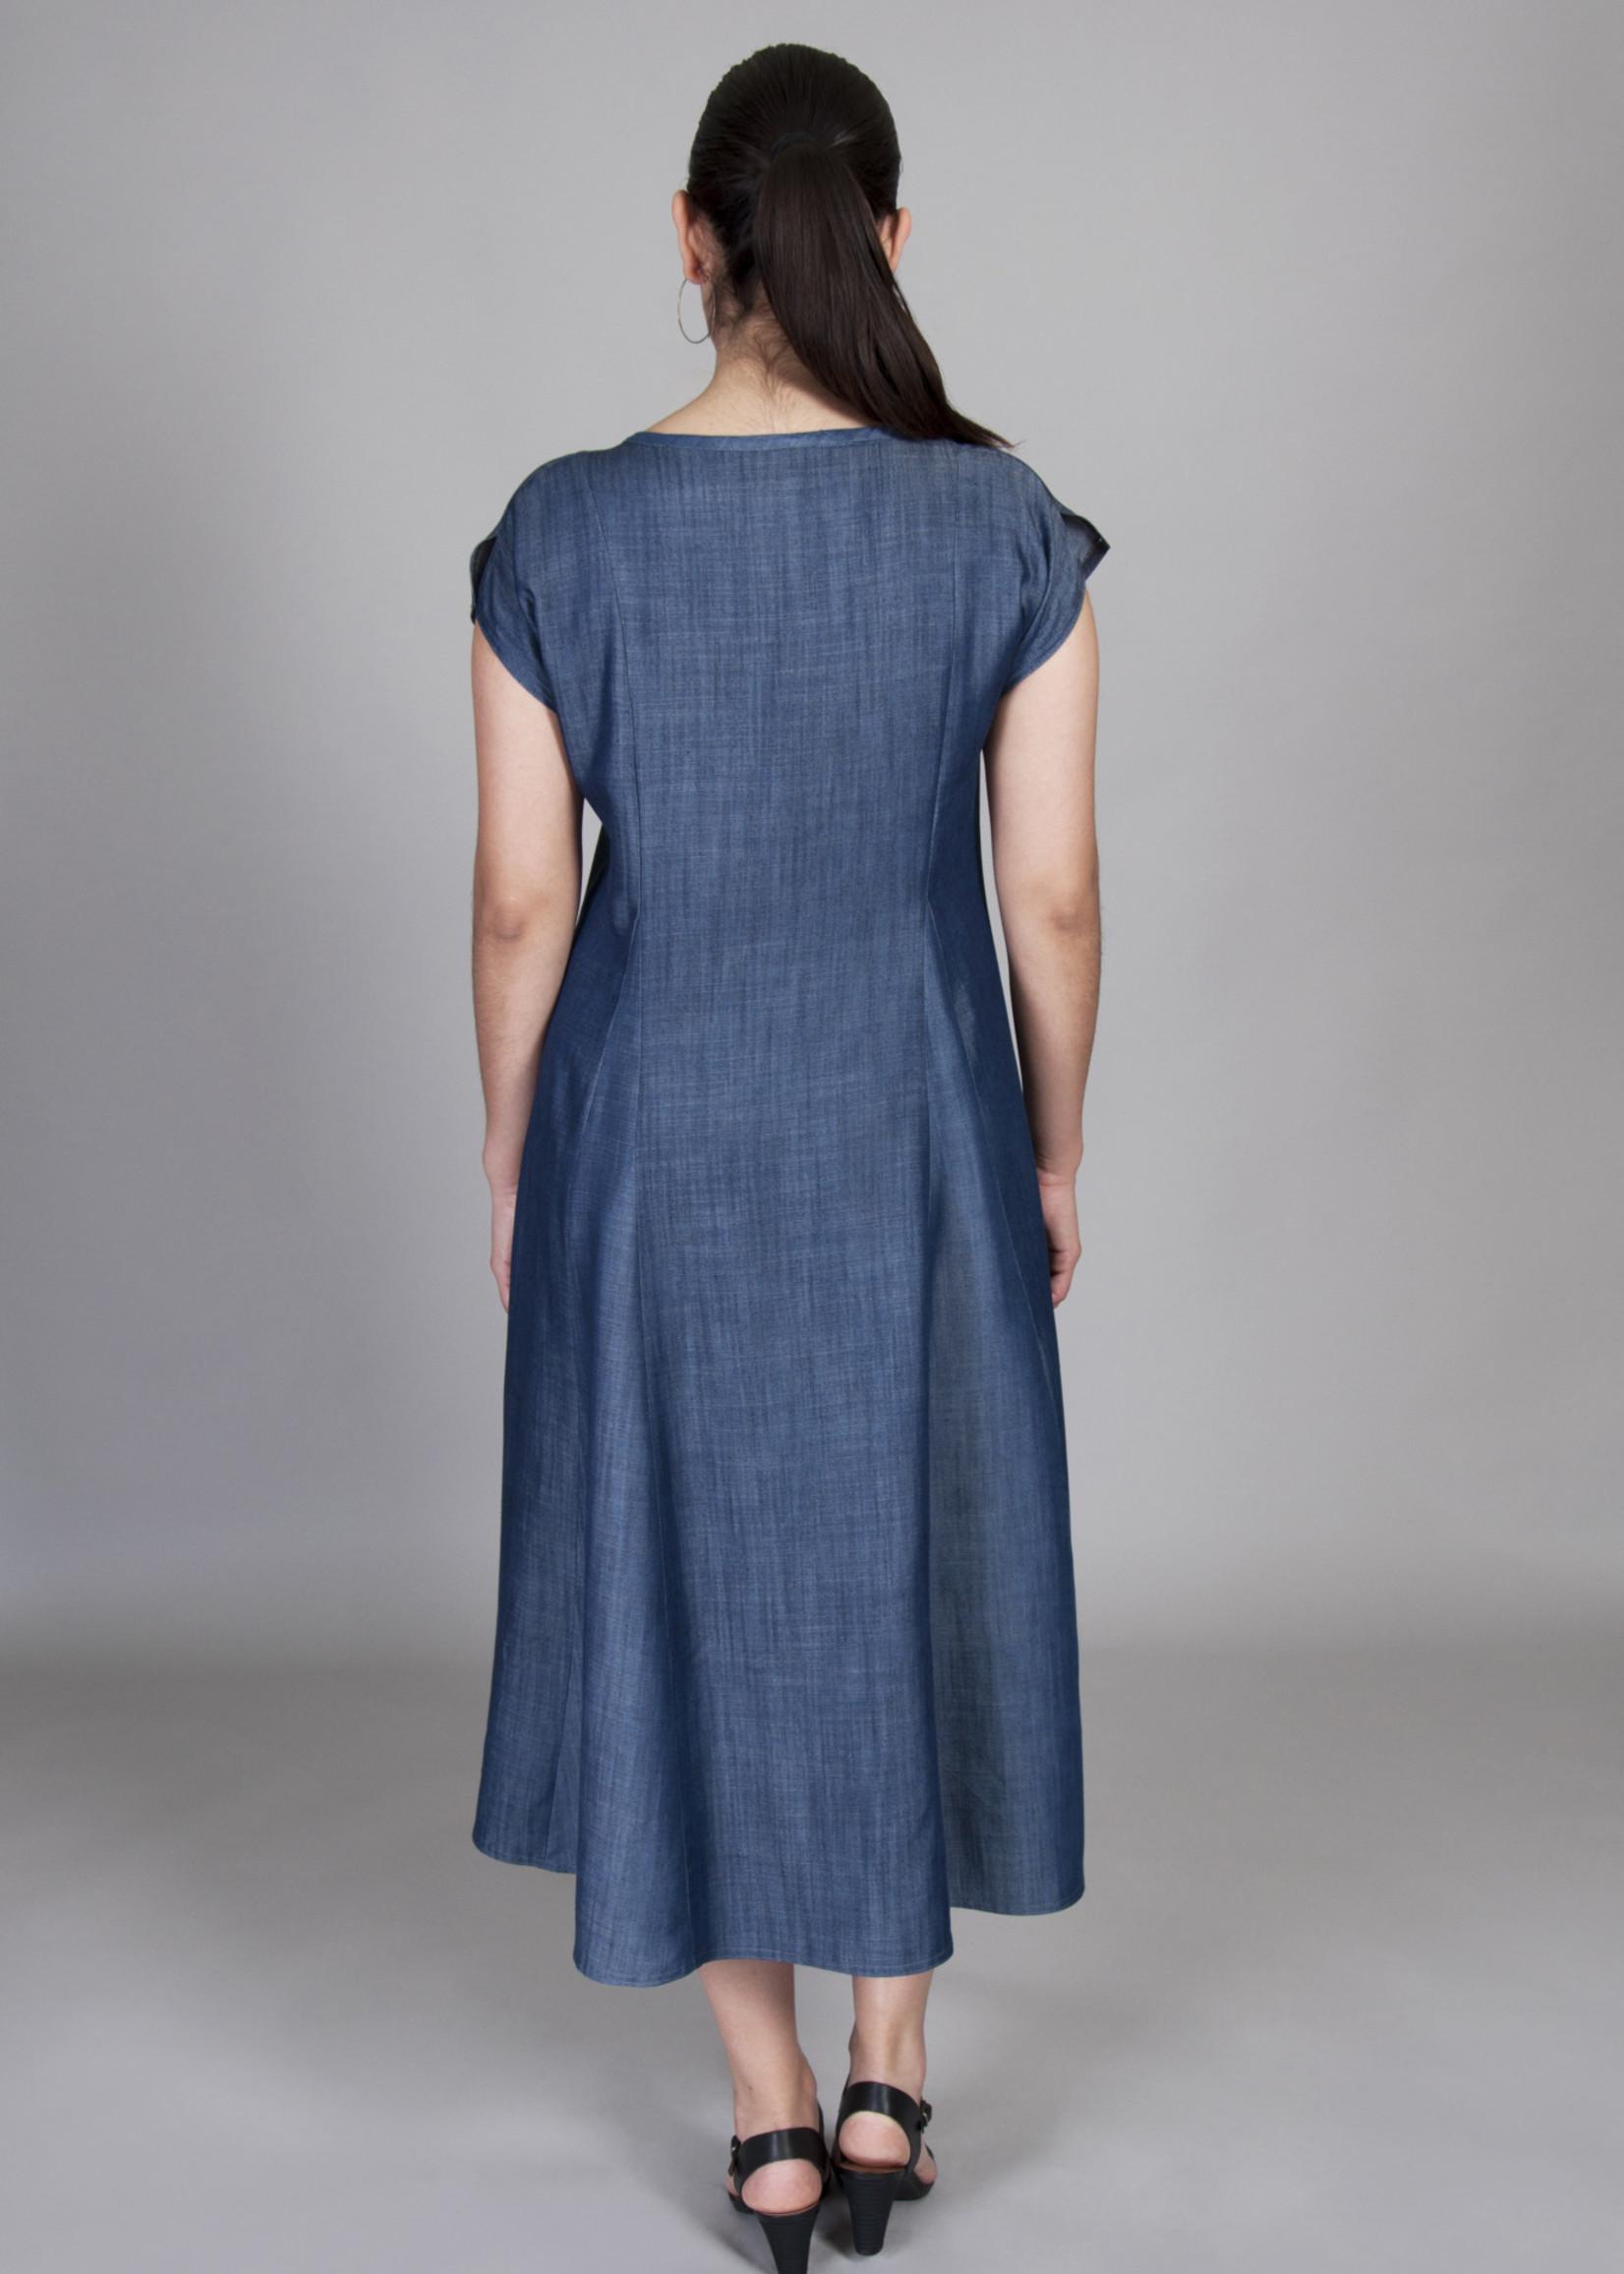 SARAH KUENYEFU MID-LENGTH INSERT TENCEL DRESS